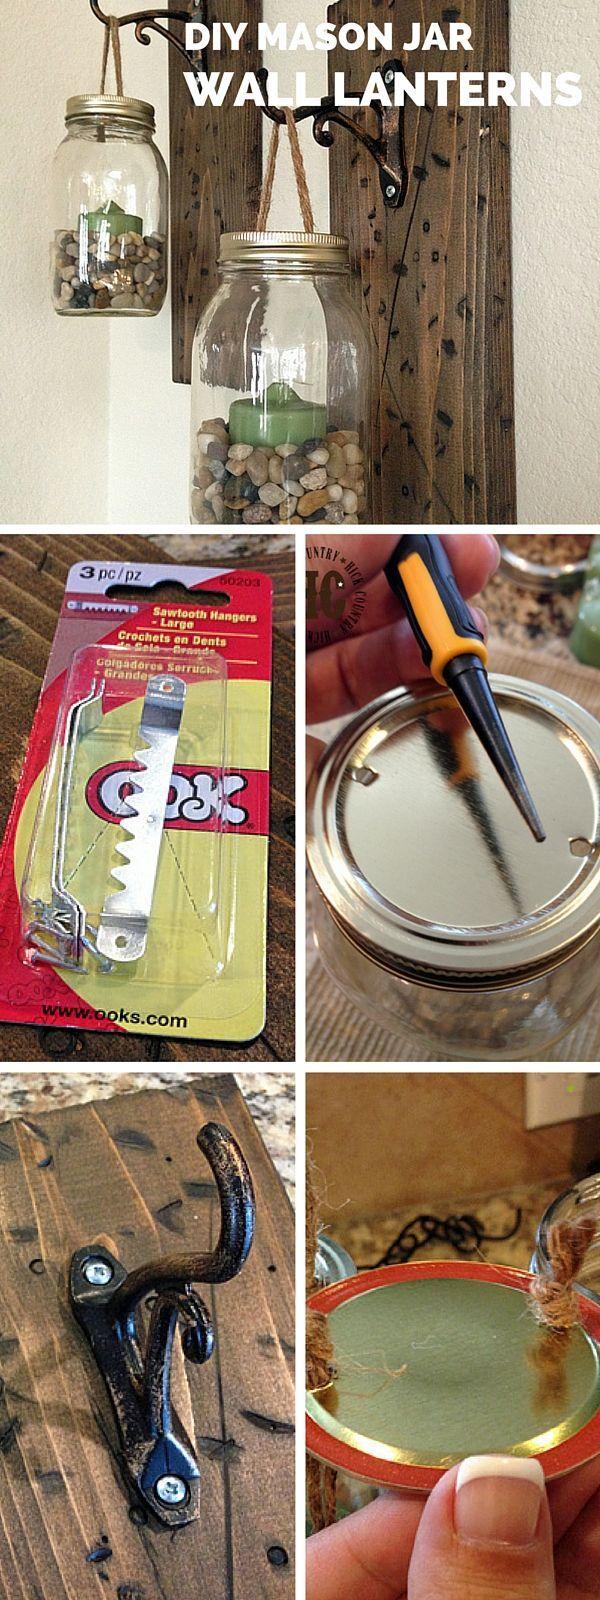 Check out the tutorial: #DIY Mason Jar Wall Lanterns #crafts #homedecor